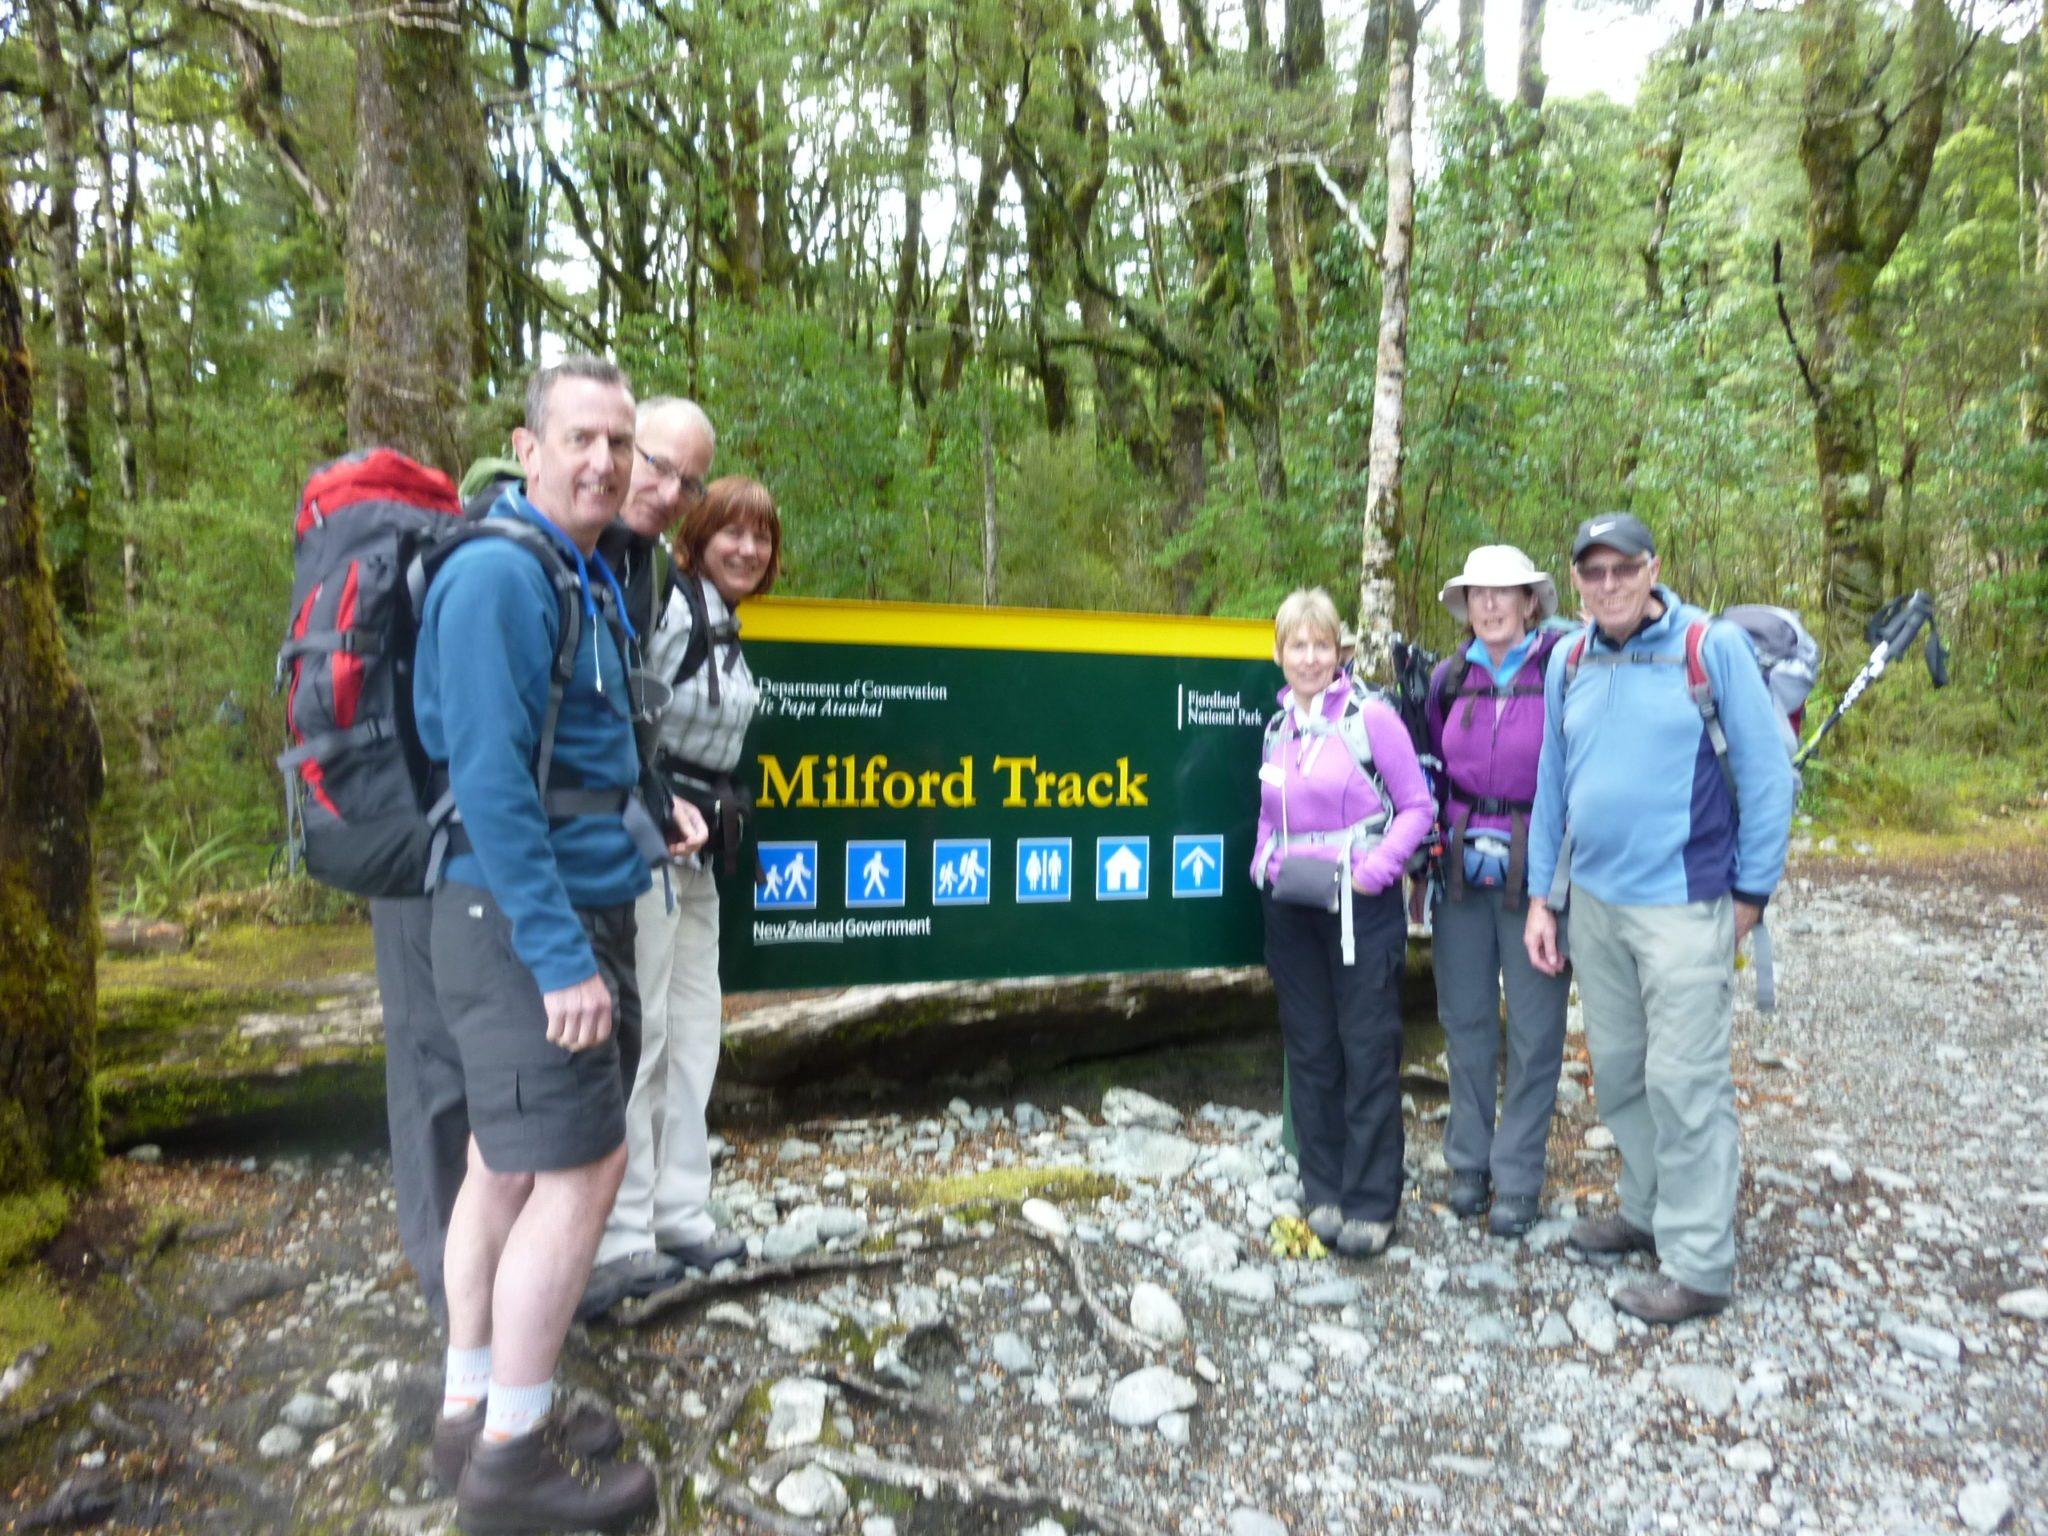 Milford Track - Start